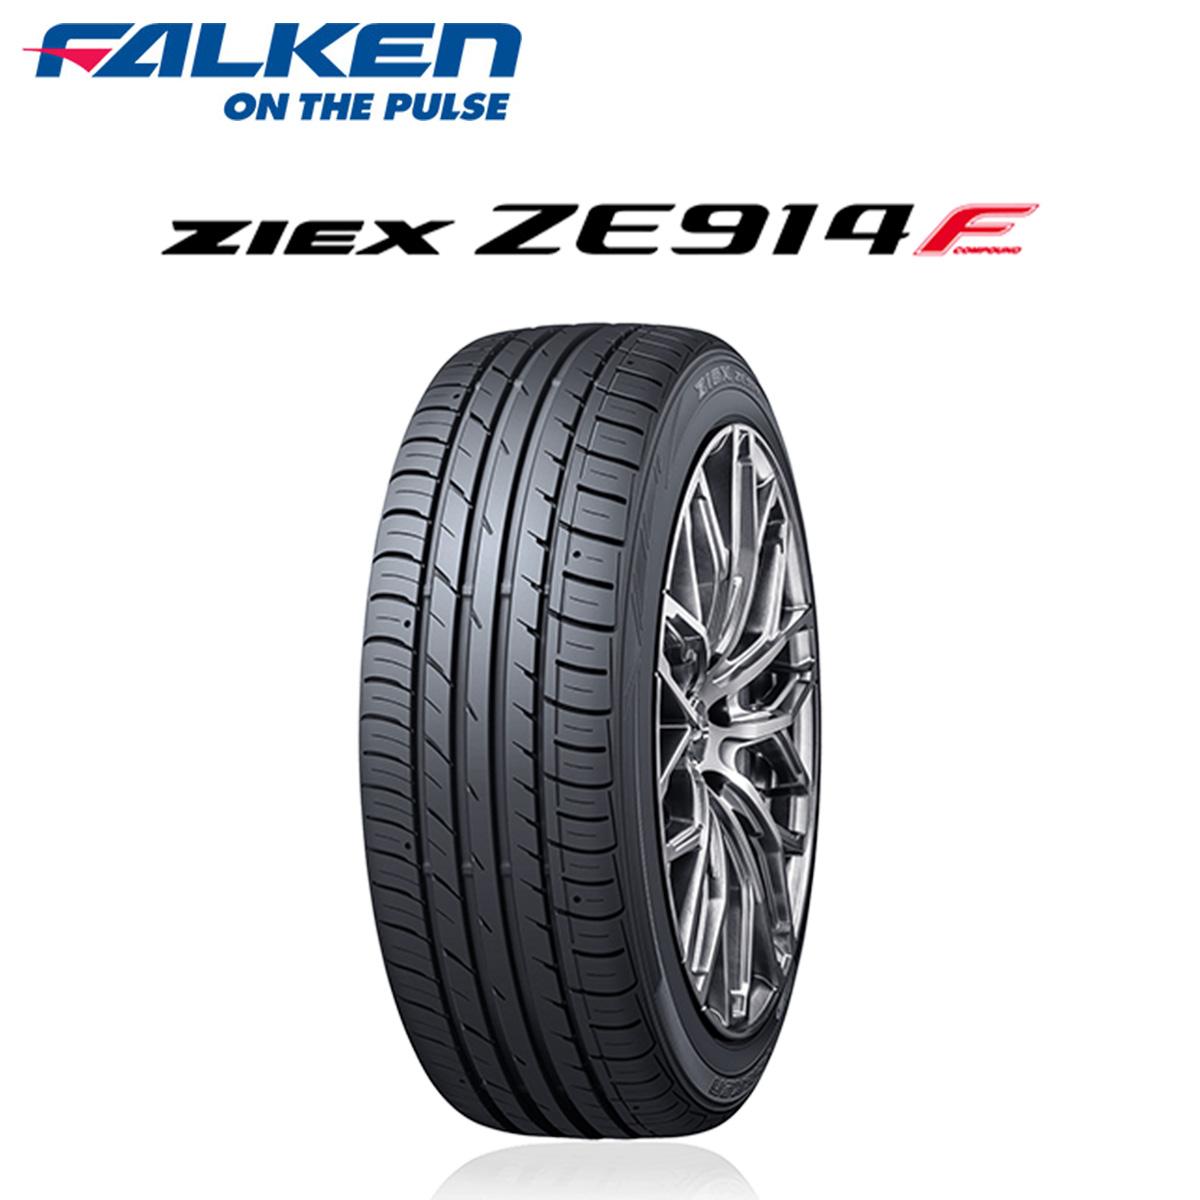 FALKEN ファルケン 低燃費 サマータイヤ 4本 セット 17インチ 205/45R17 ZIEX ZE914F ジークス